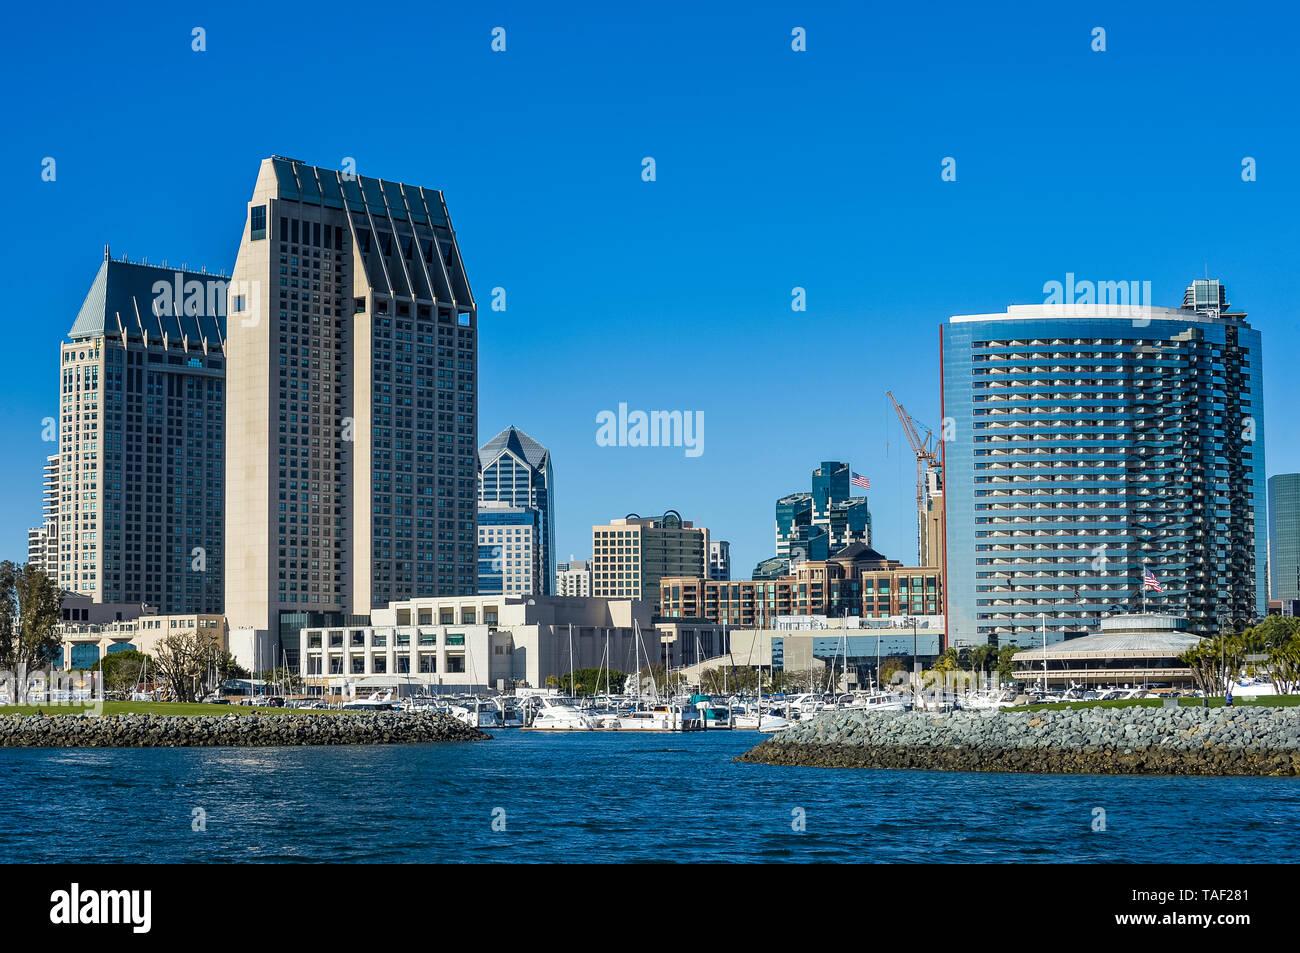 USA, California, San Diego, Skyline - Stock Image